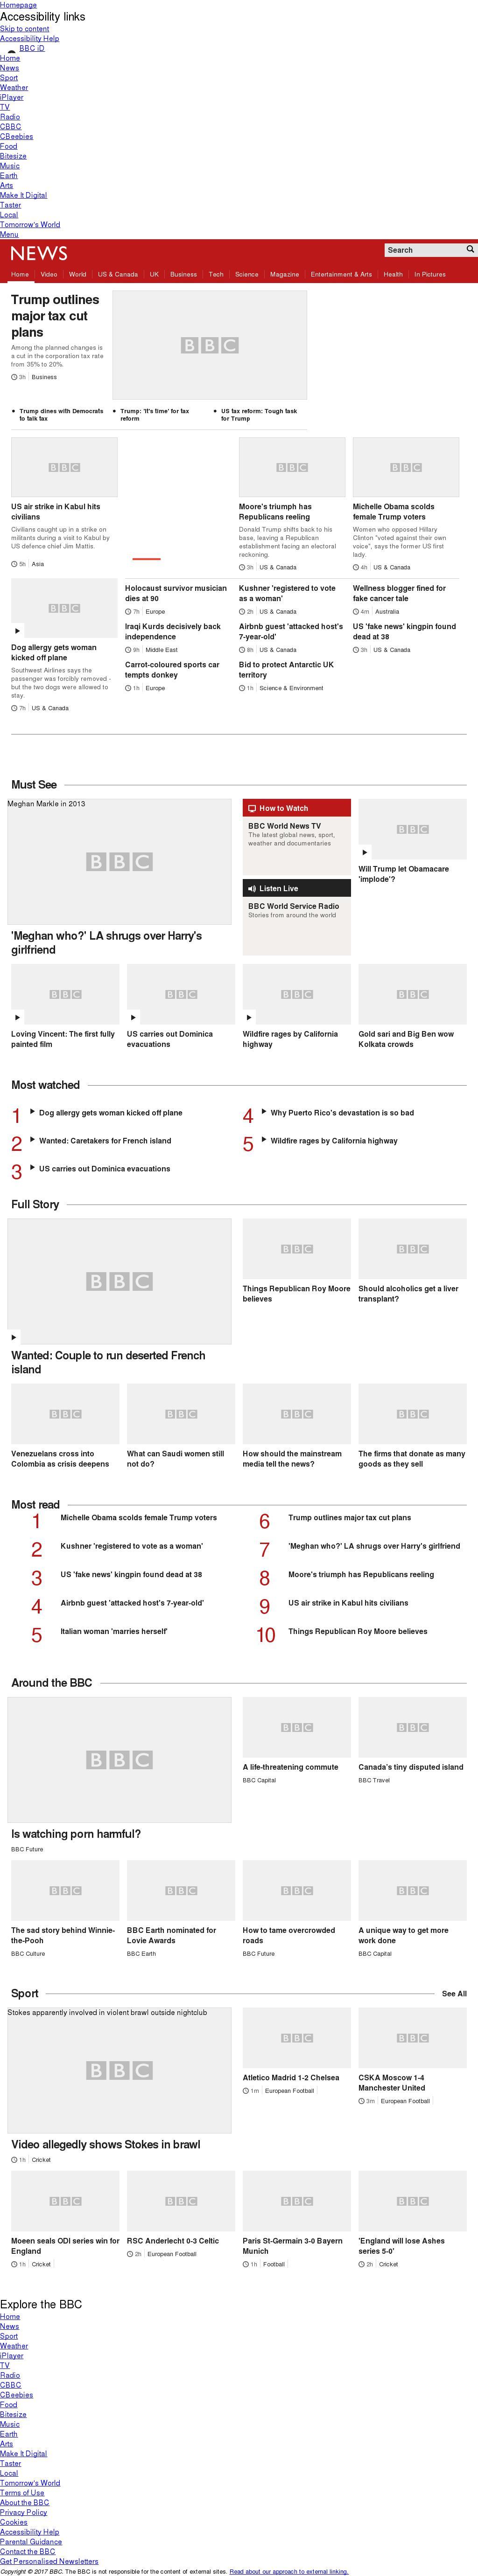 BBC at Thursday Sept. 28, 2017, 1 a.m. UTC